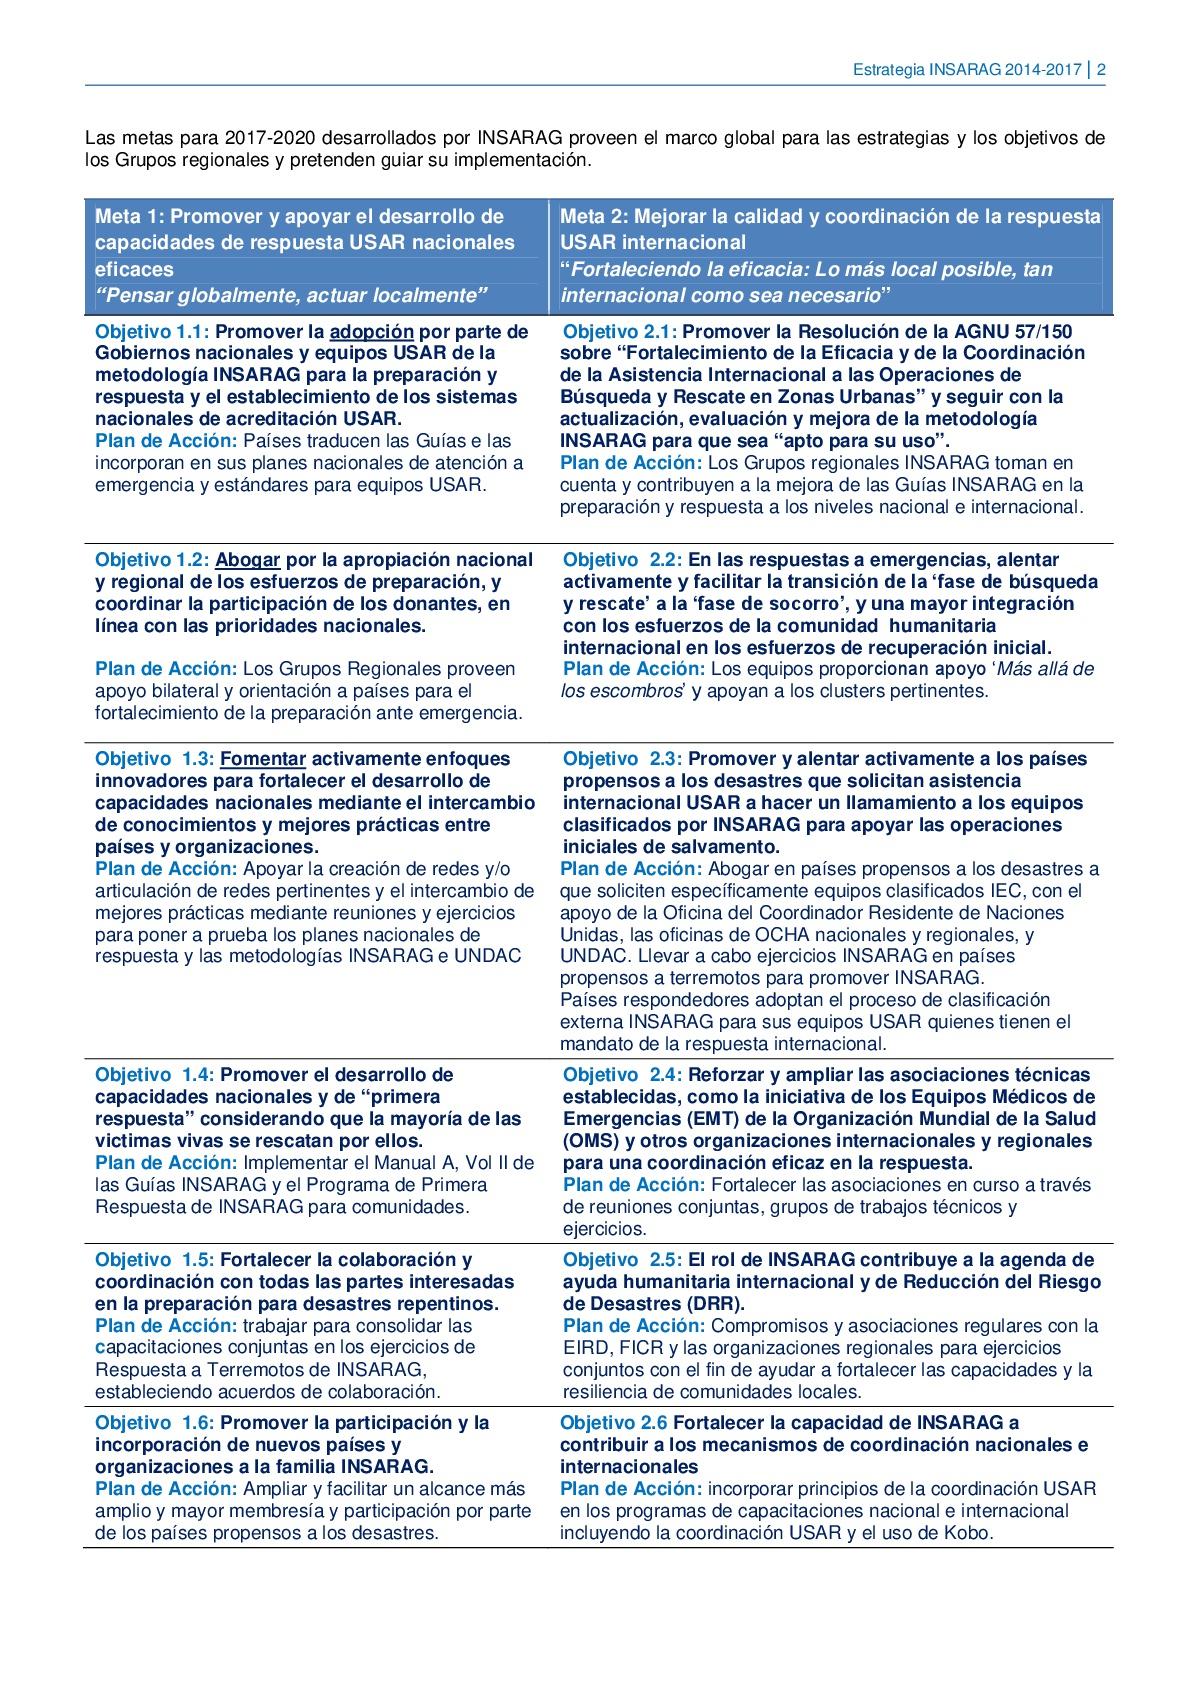 Final INSARAG Strategy 2017 2020 SPA 002